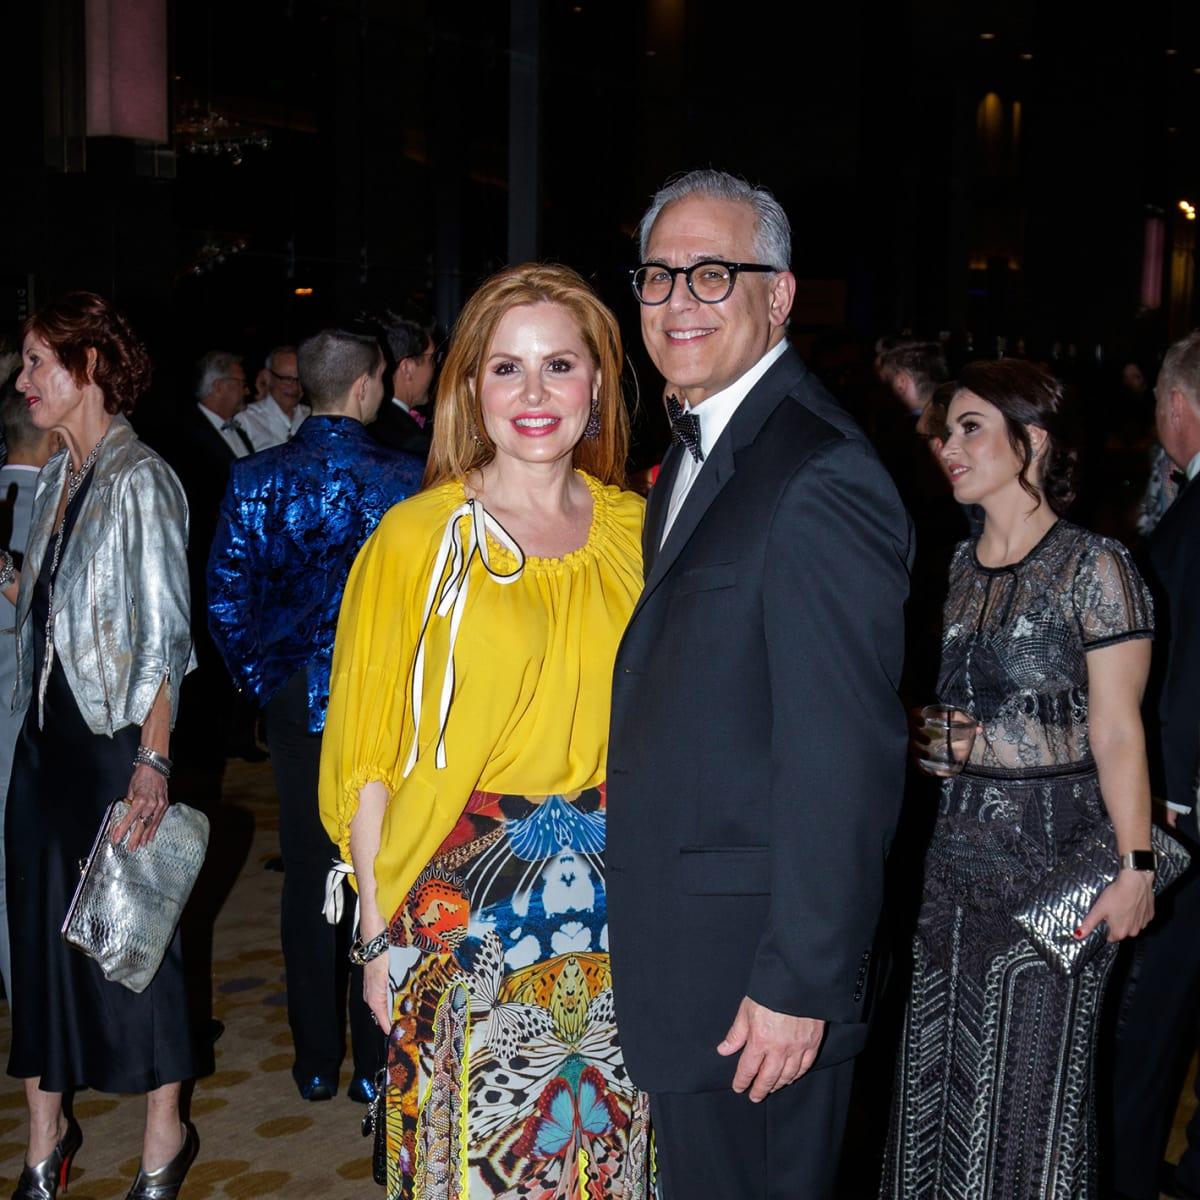 Brenda Meloy, Bill Saplicki at House of DIFFA 2018